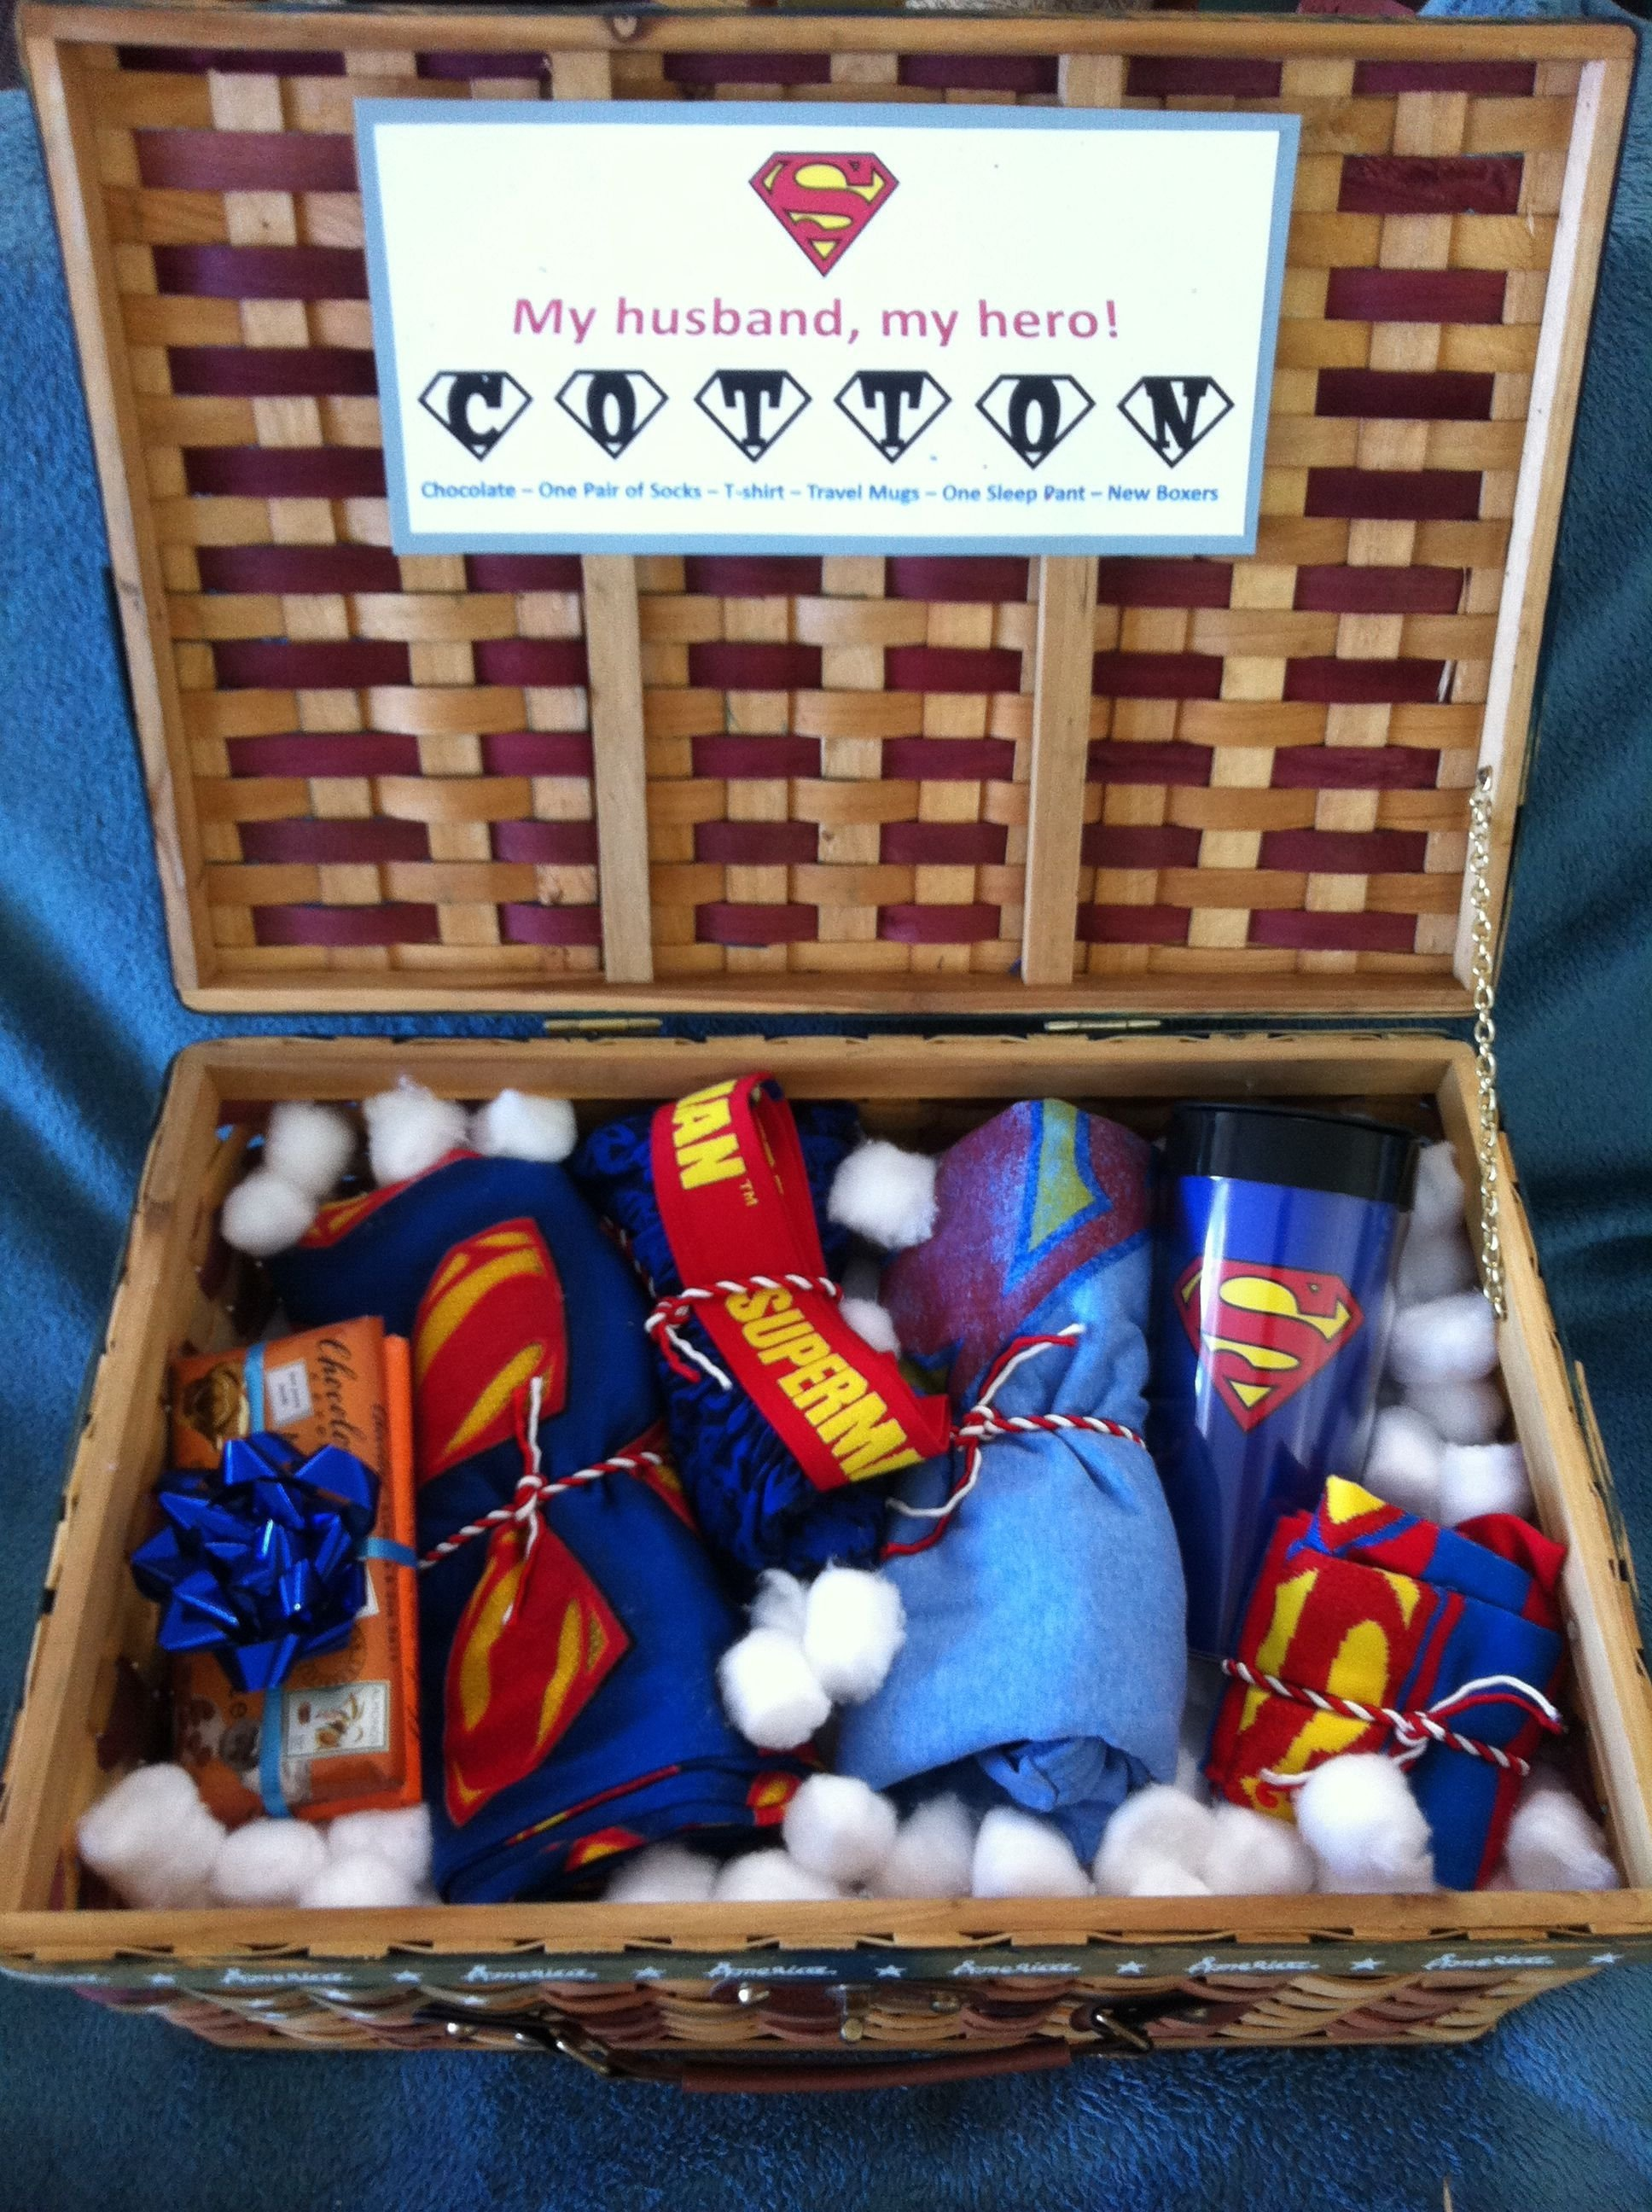 10 Elegant Cotton Anniversary Gift Ideas For Him 2nd anniversary cotton super husband basket anniversary gift 2020